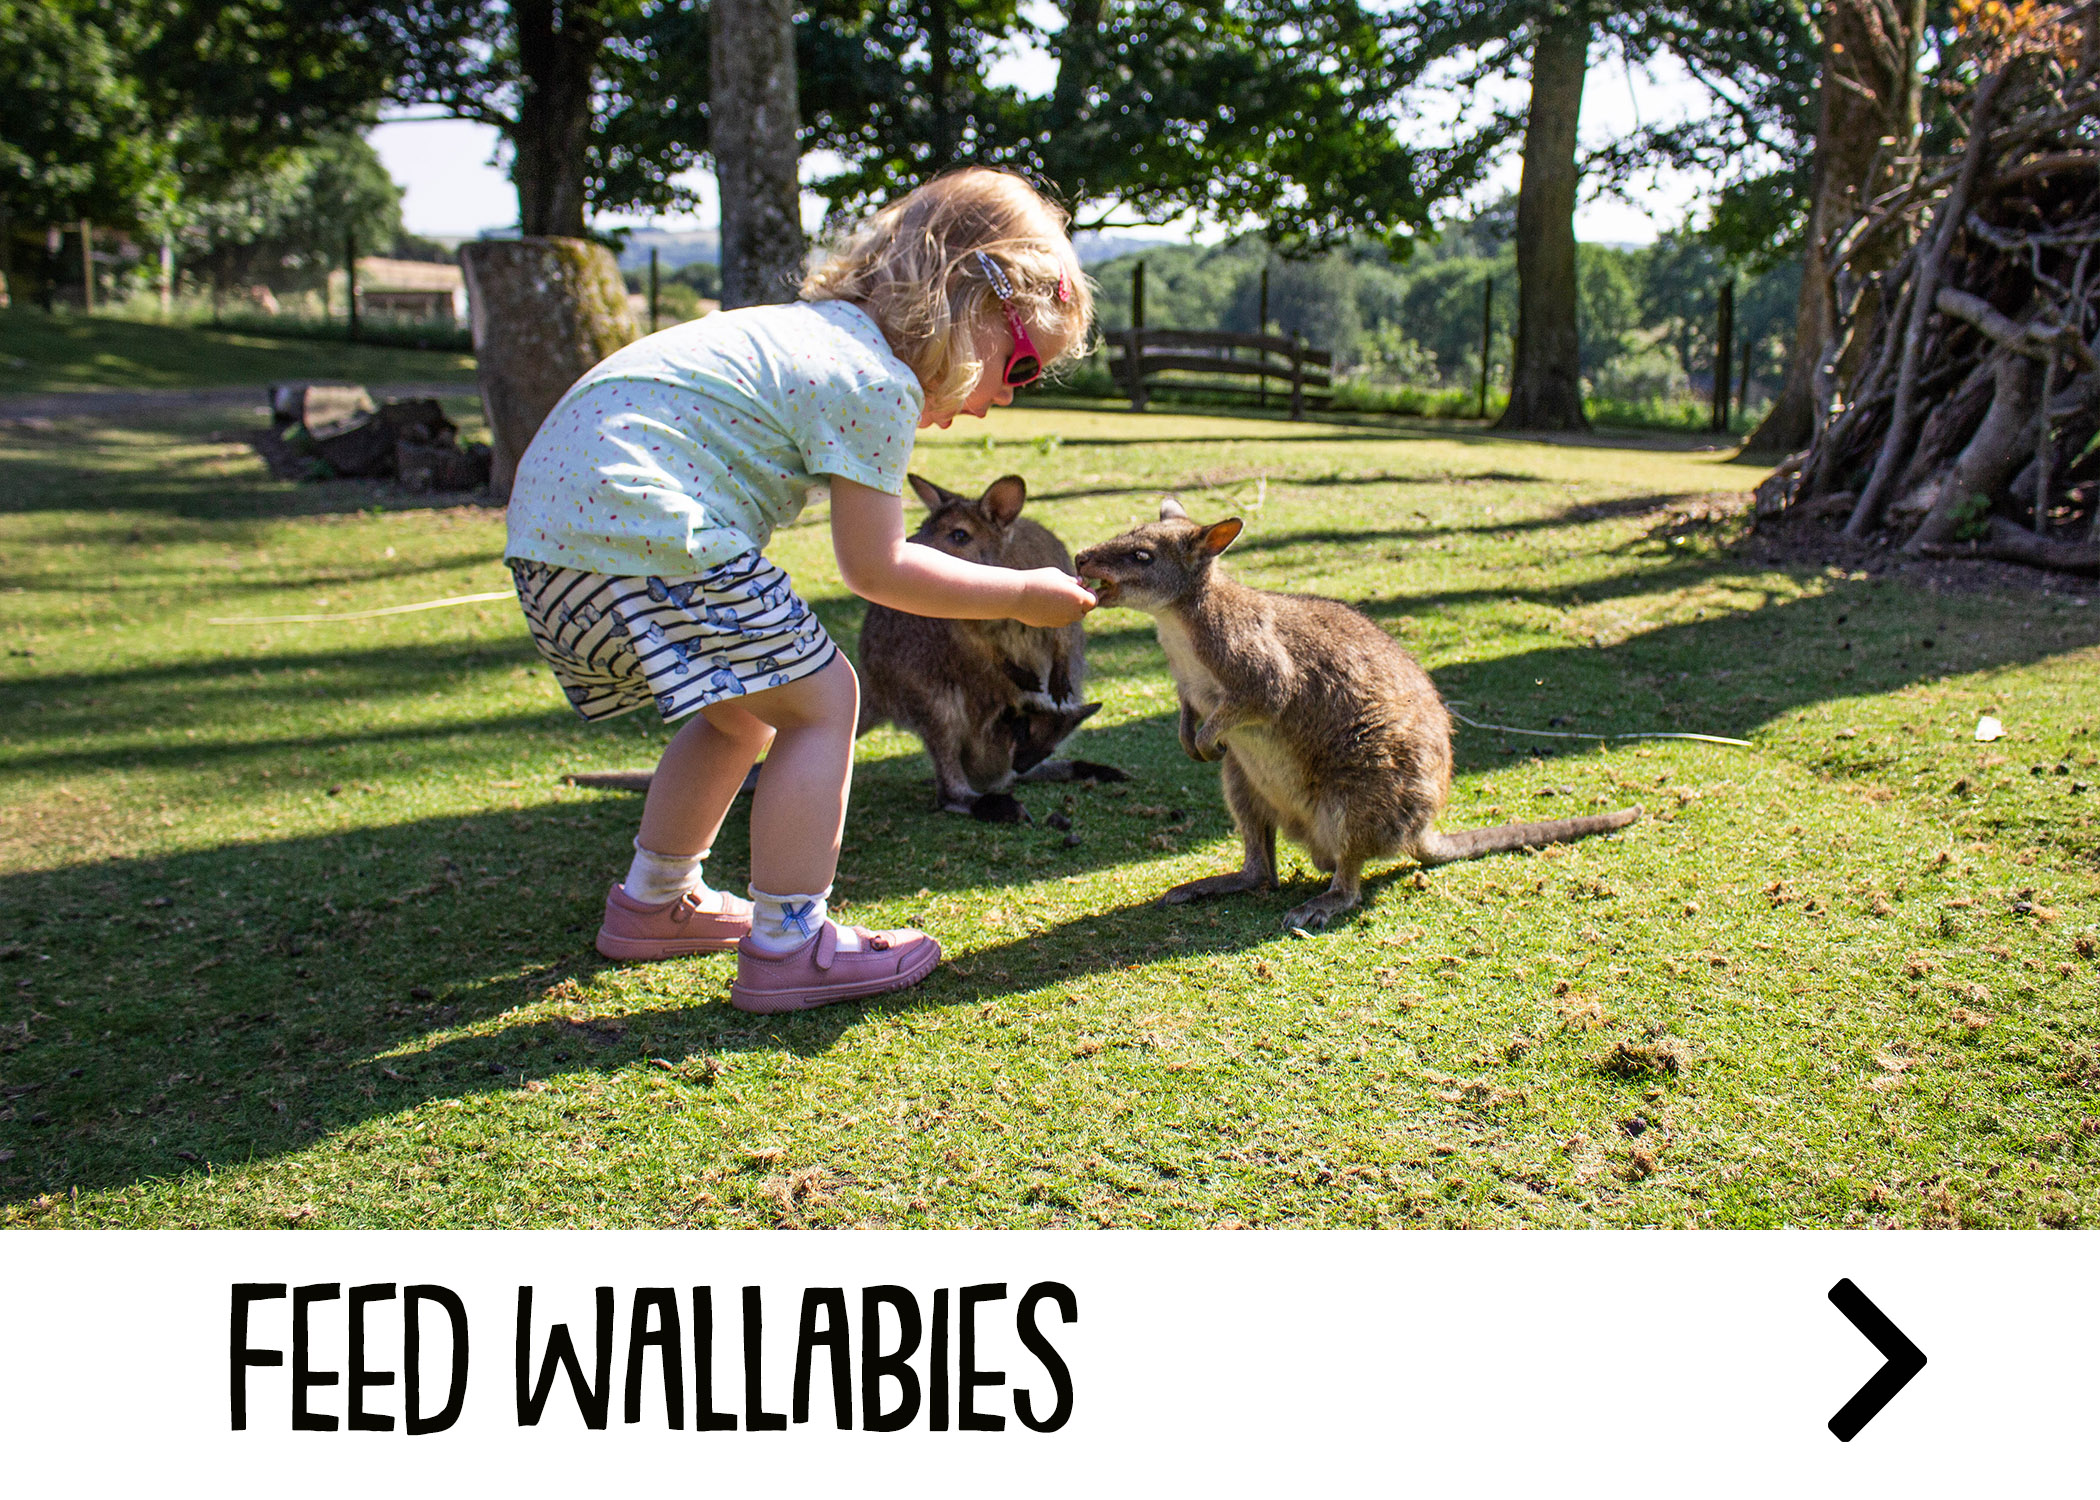 wallabies_attraction.jpg